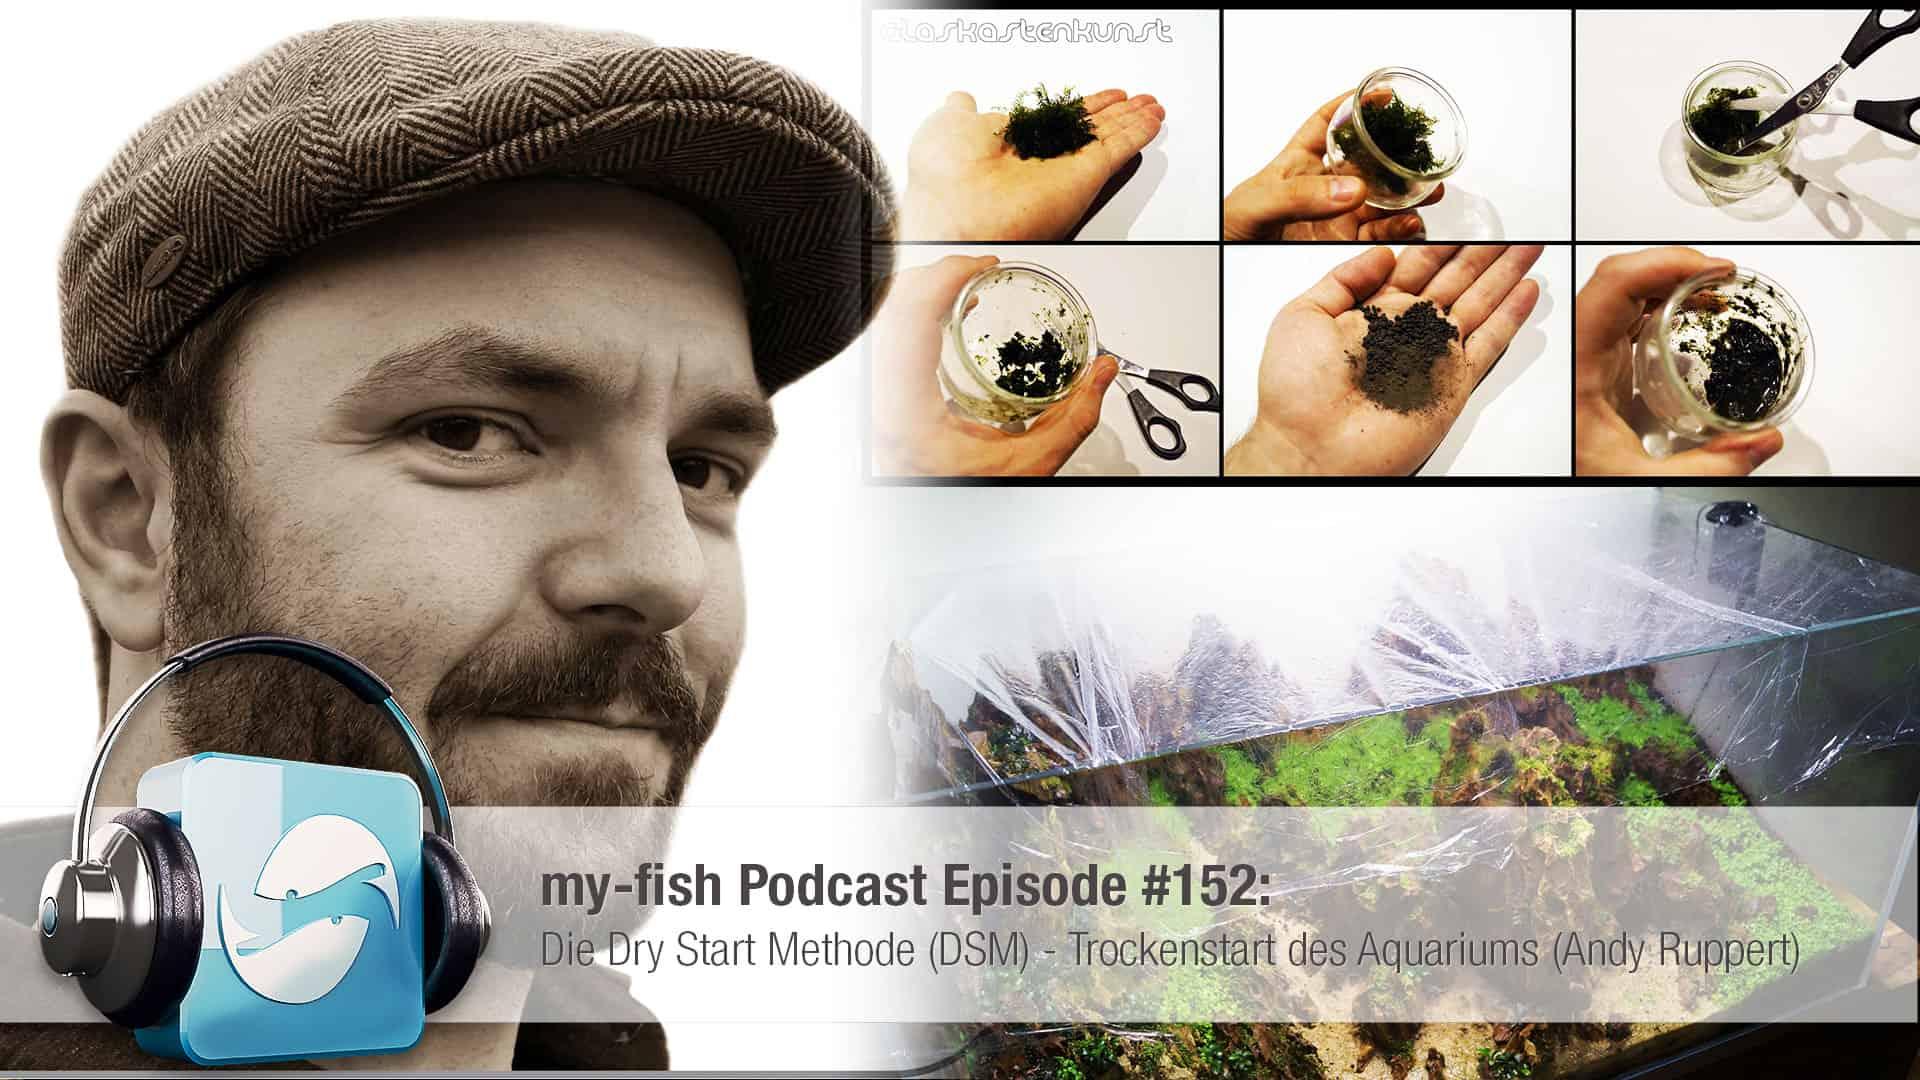 Podcast Episode #152: Die Dry Start Methode (DSM) - Trockenstart des Aquariums (Andy Ruppert) 1